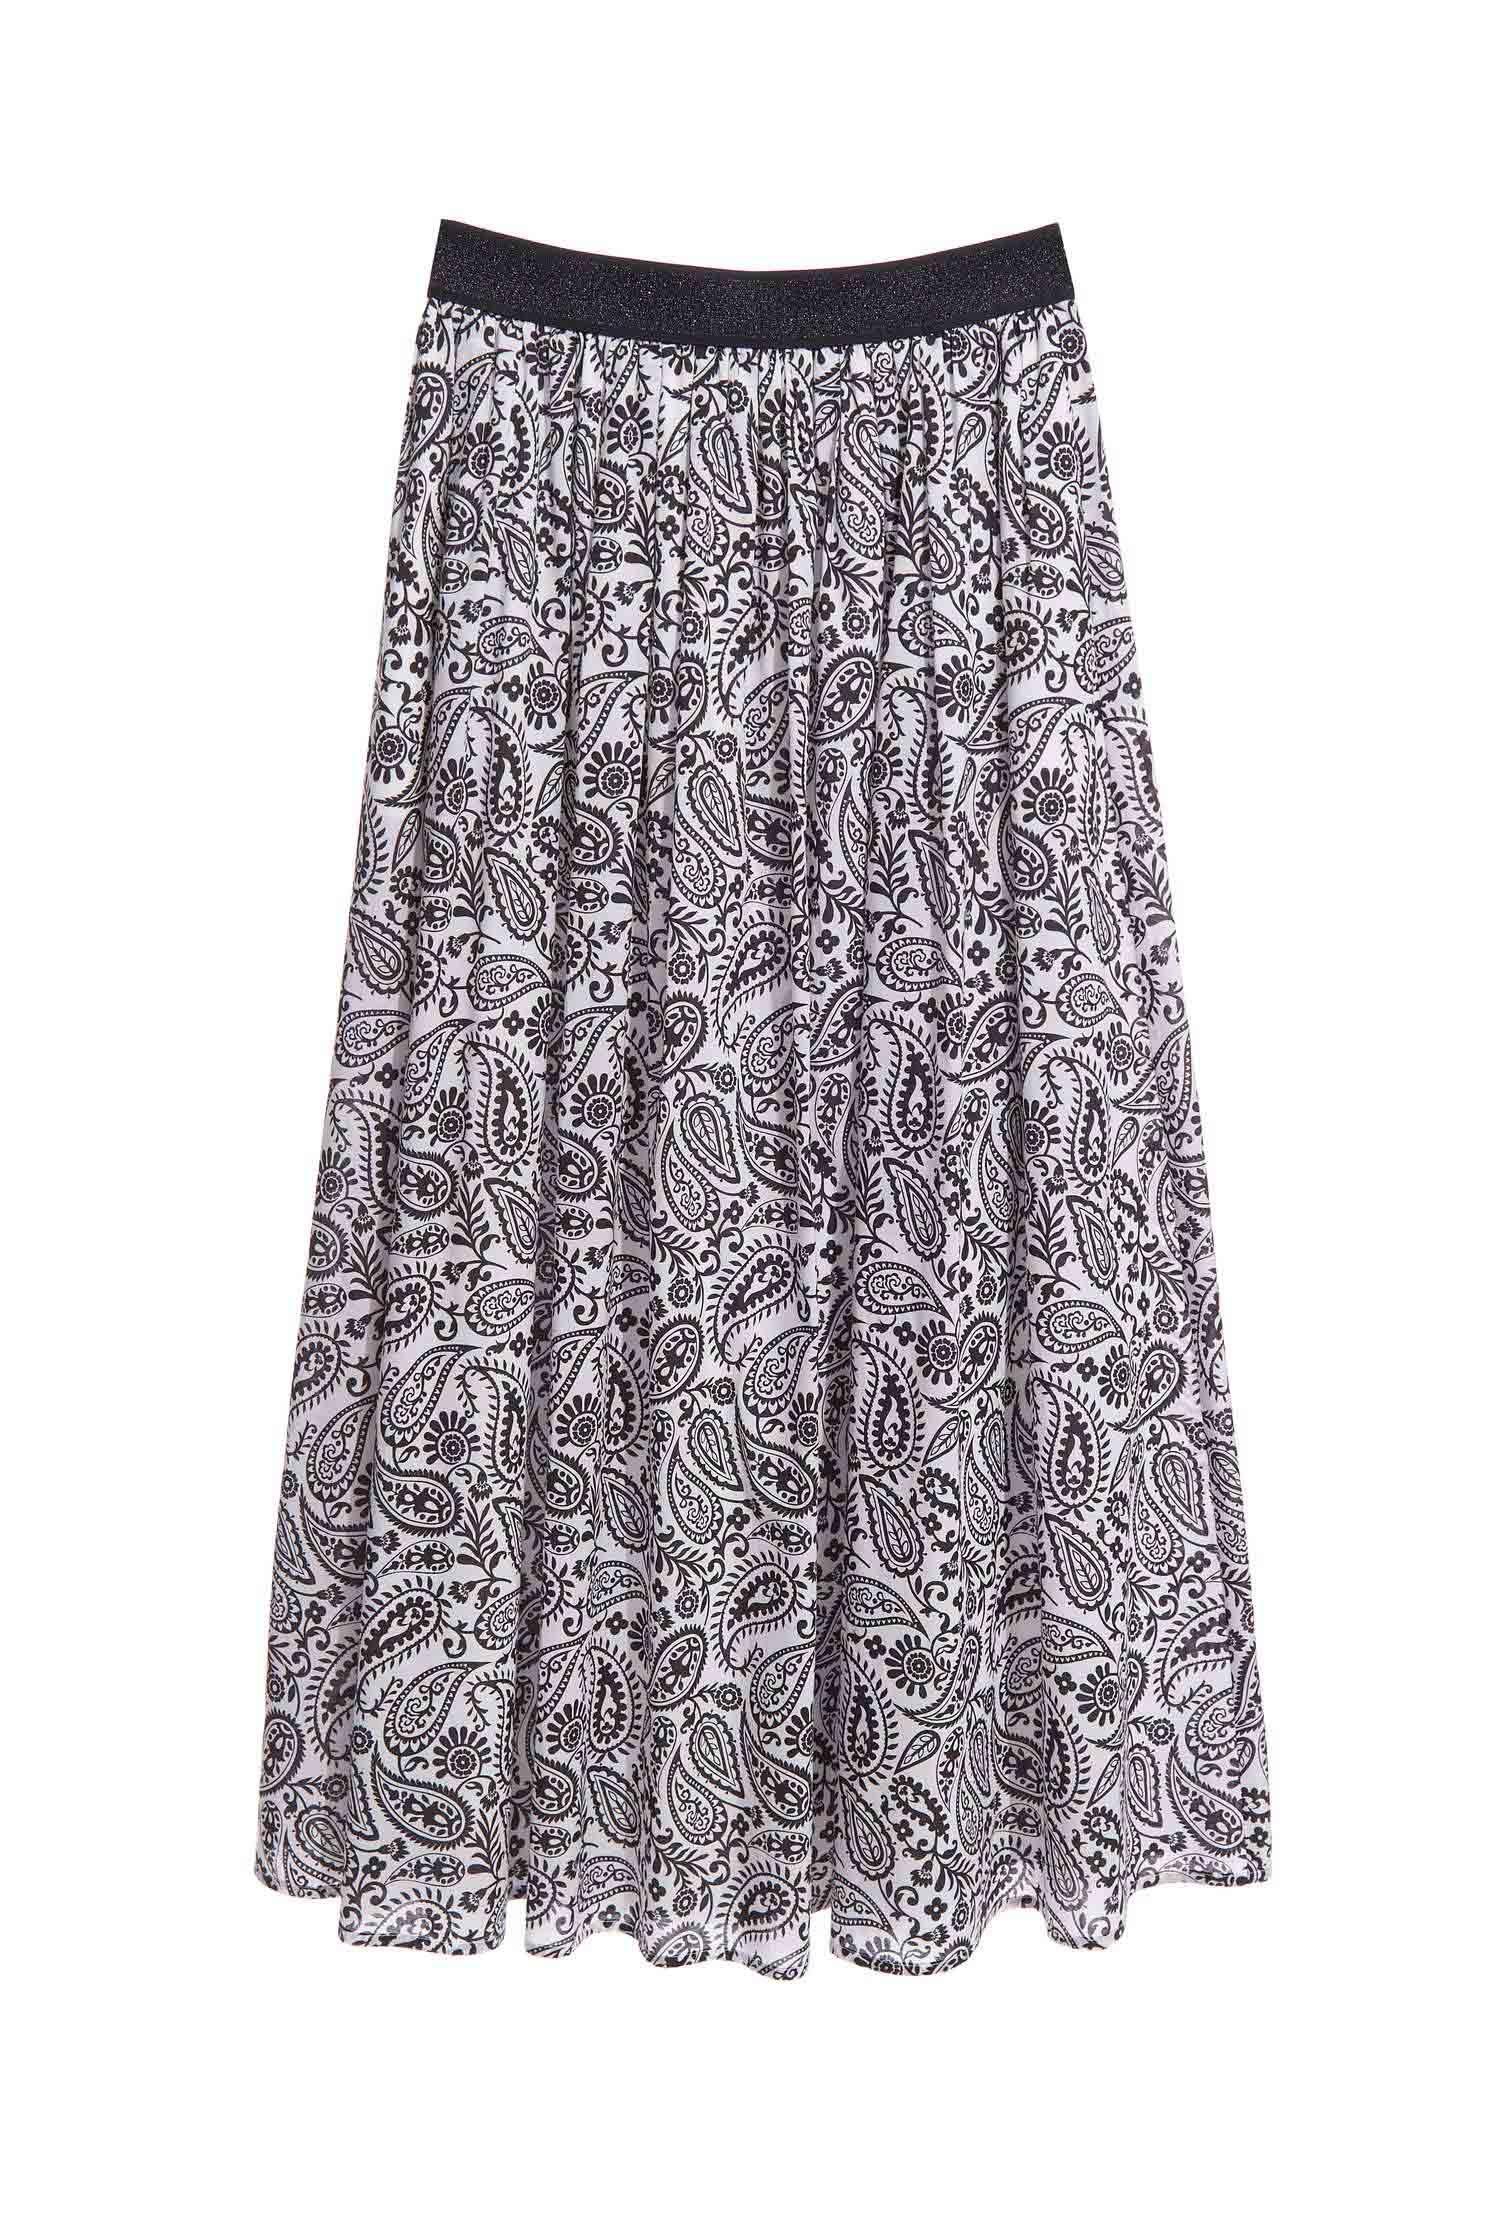 Paramecium floral print long skirt,Season (AW) Look,Midi skirts